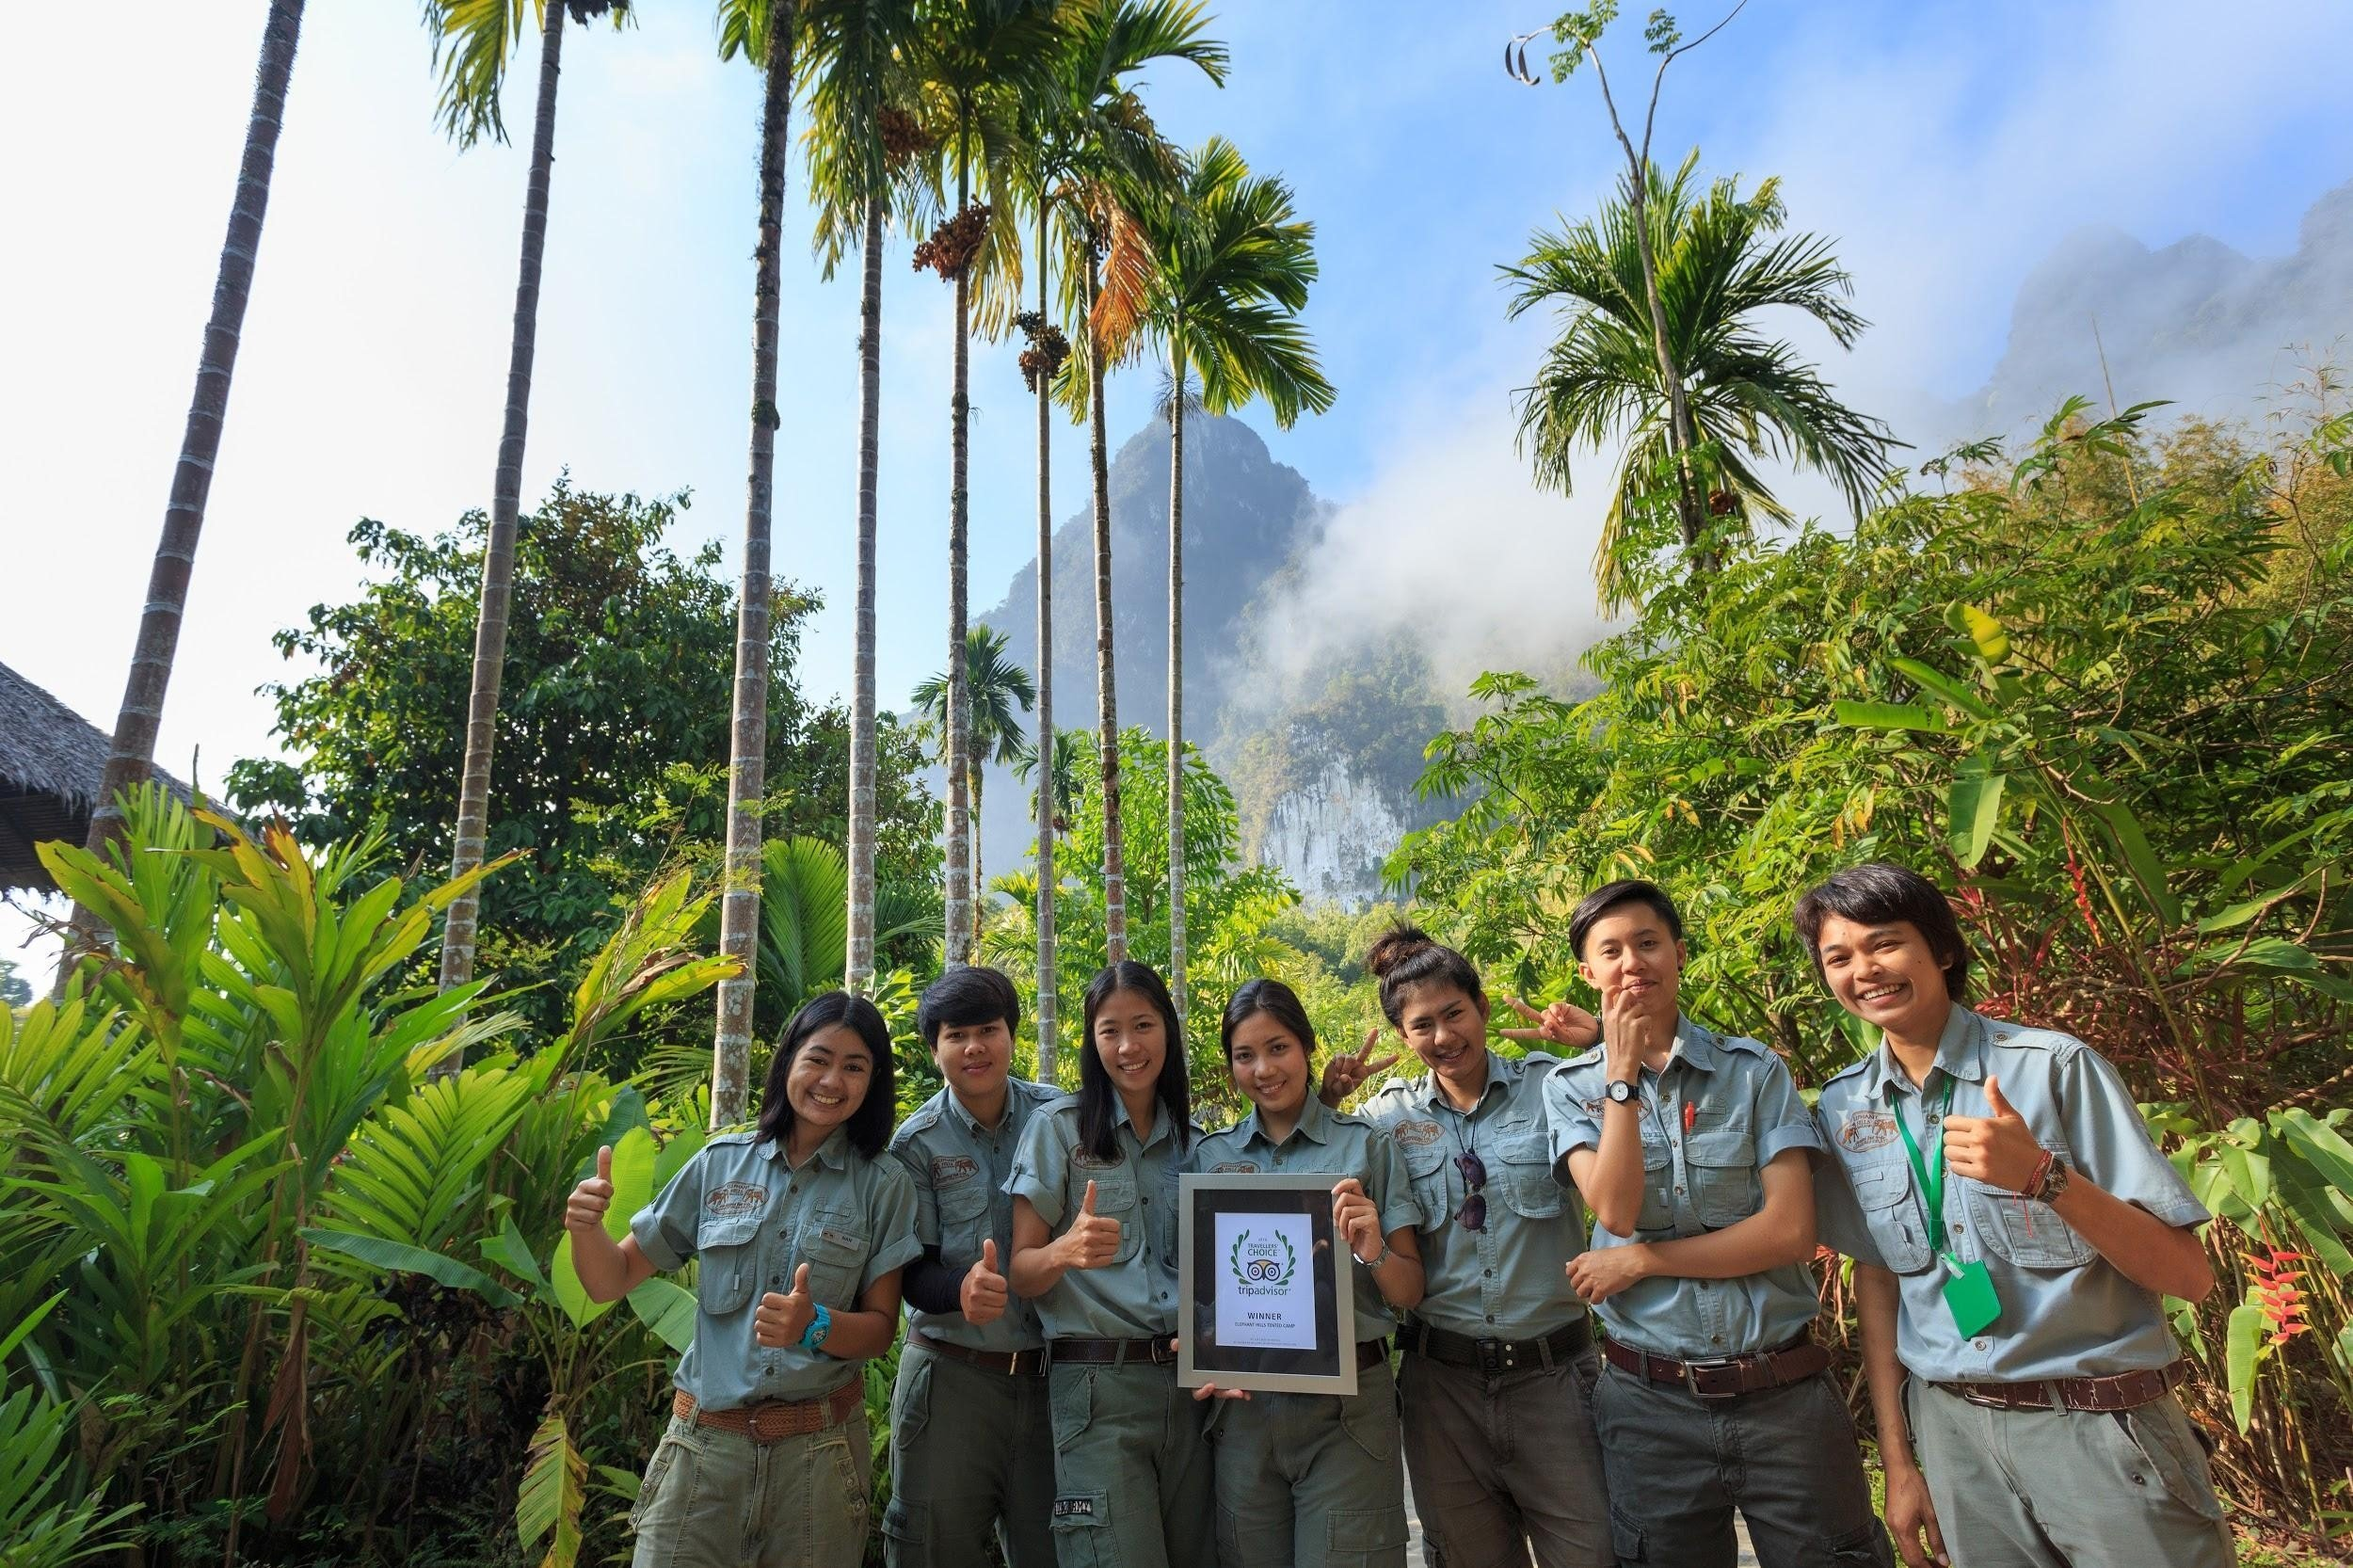 Elephant Hills tour guides celebrate TripAdvisor award for best hotel in Khao Sok